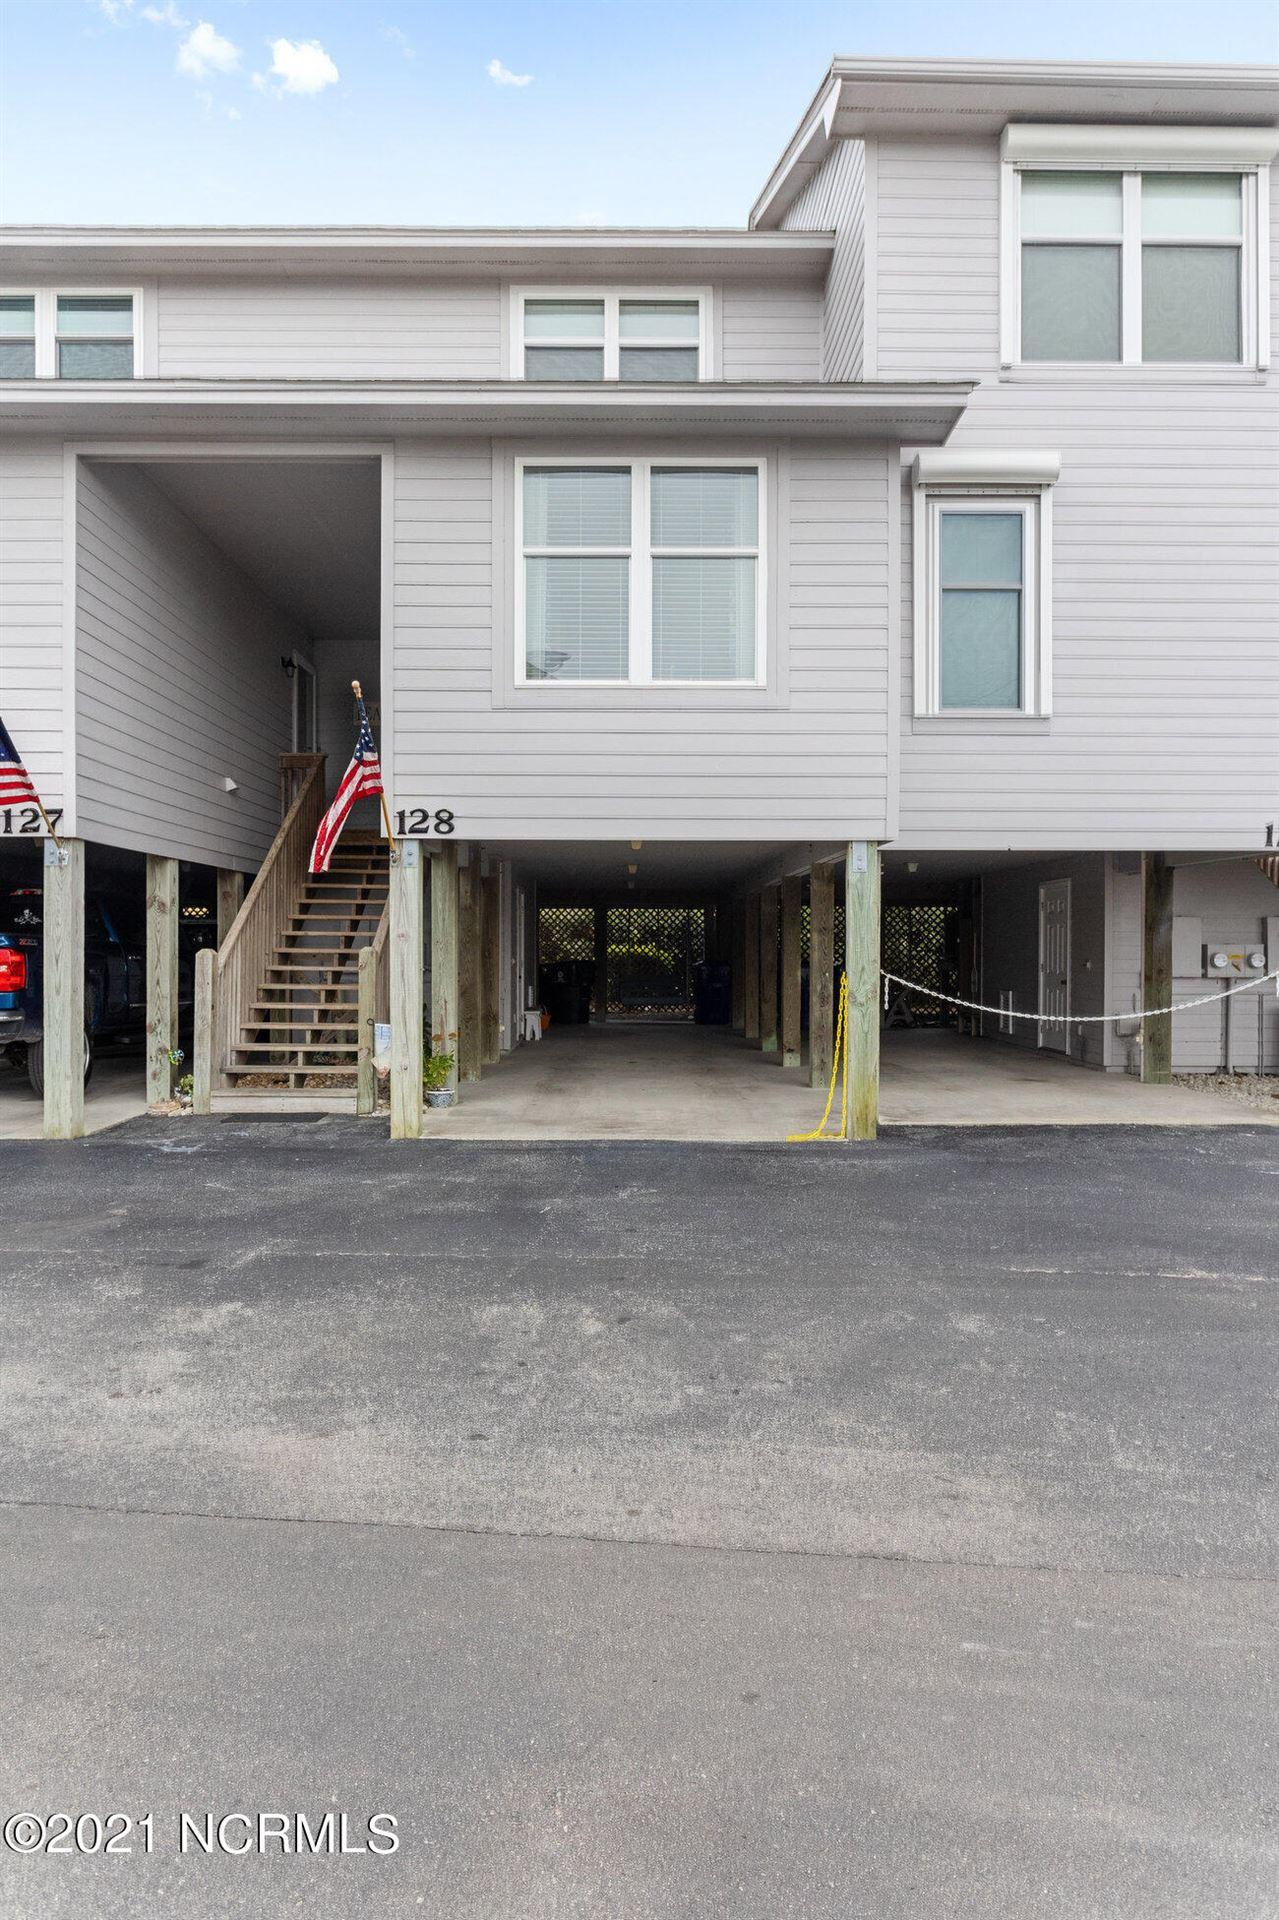 Photo of 128 Crosswinds Drive, Surf City, NC 28445 (MLS # 100295028)